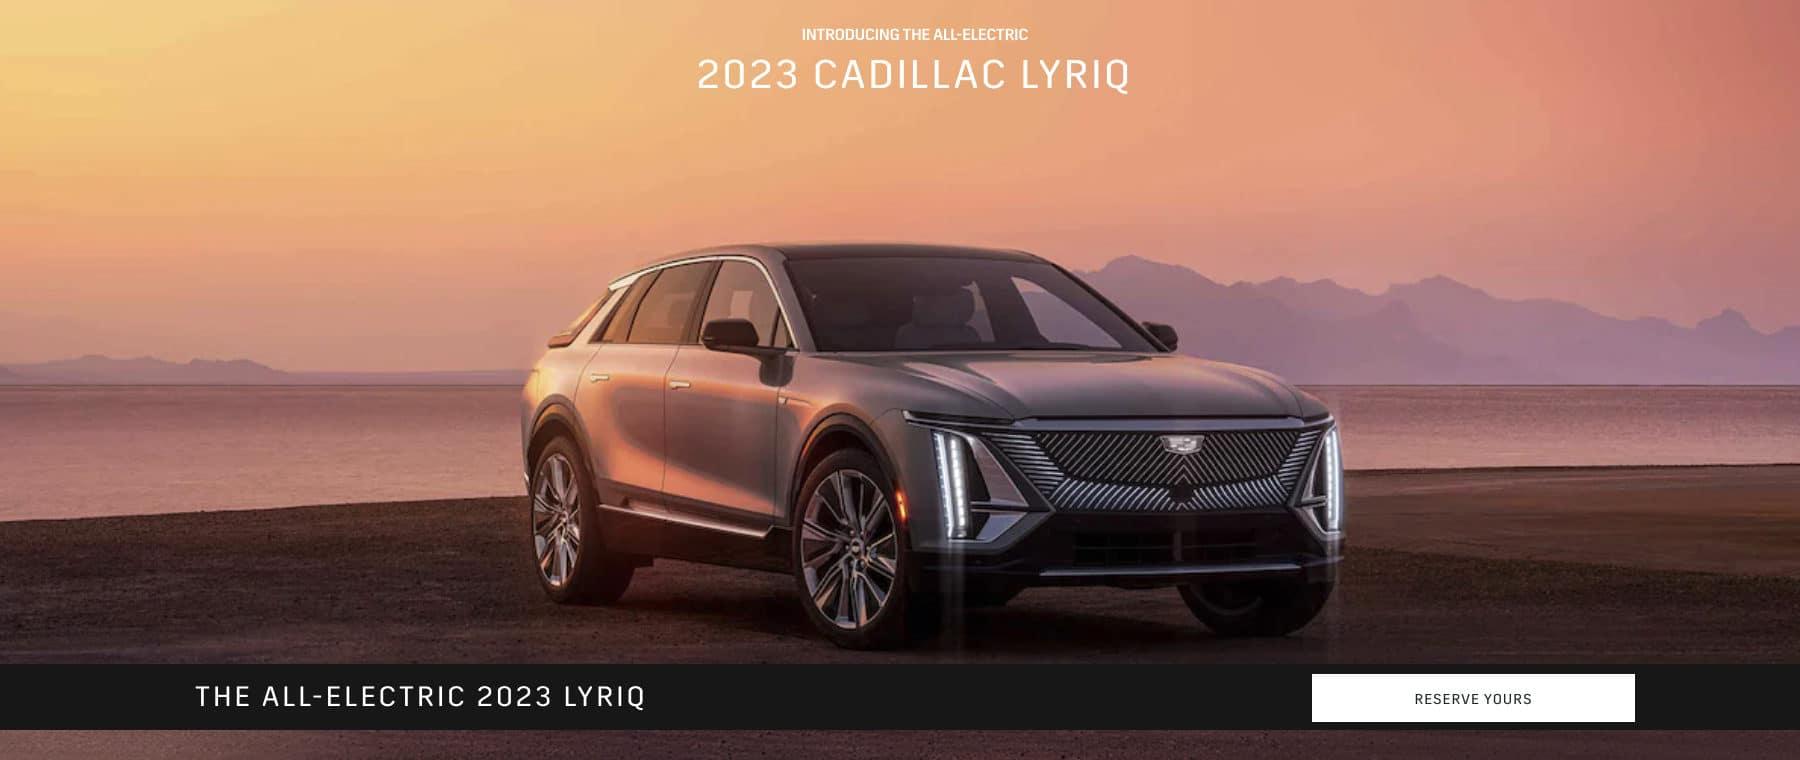 Lyric Cadillac PEI